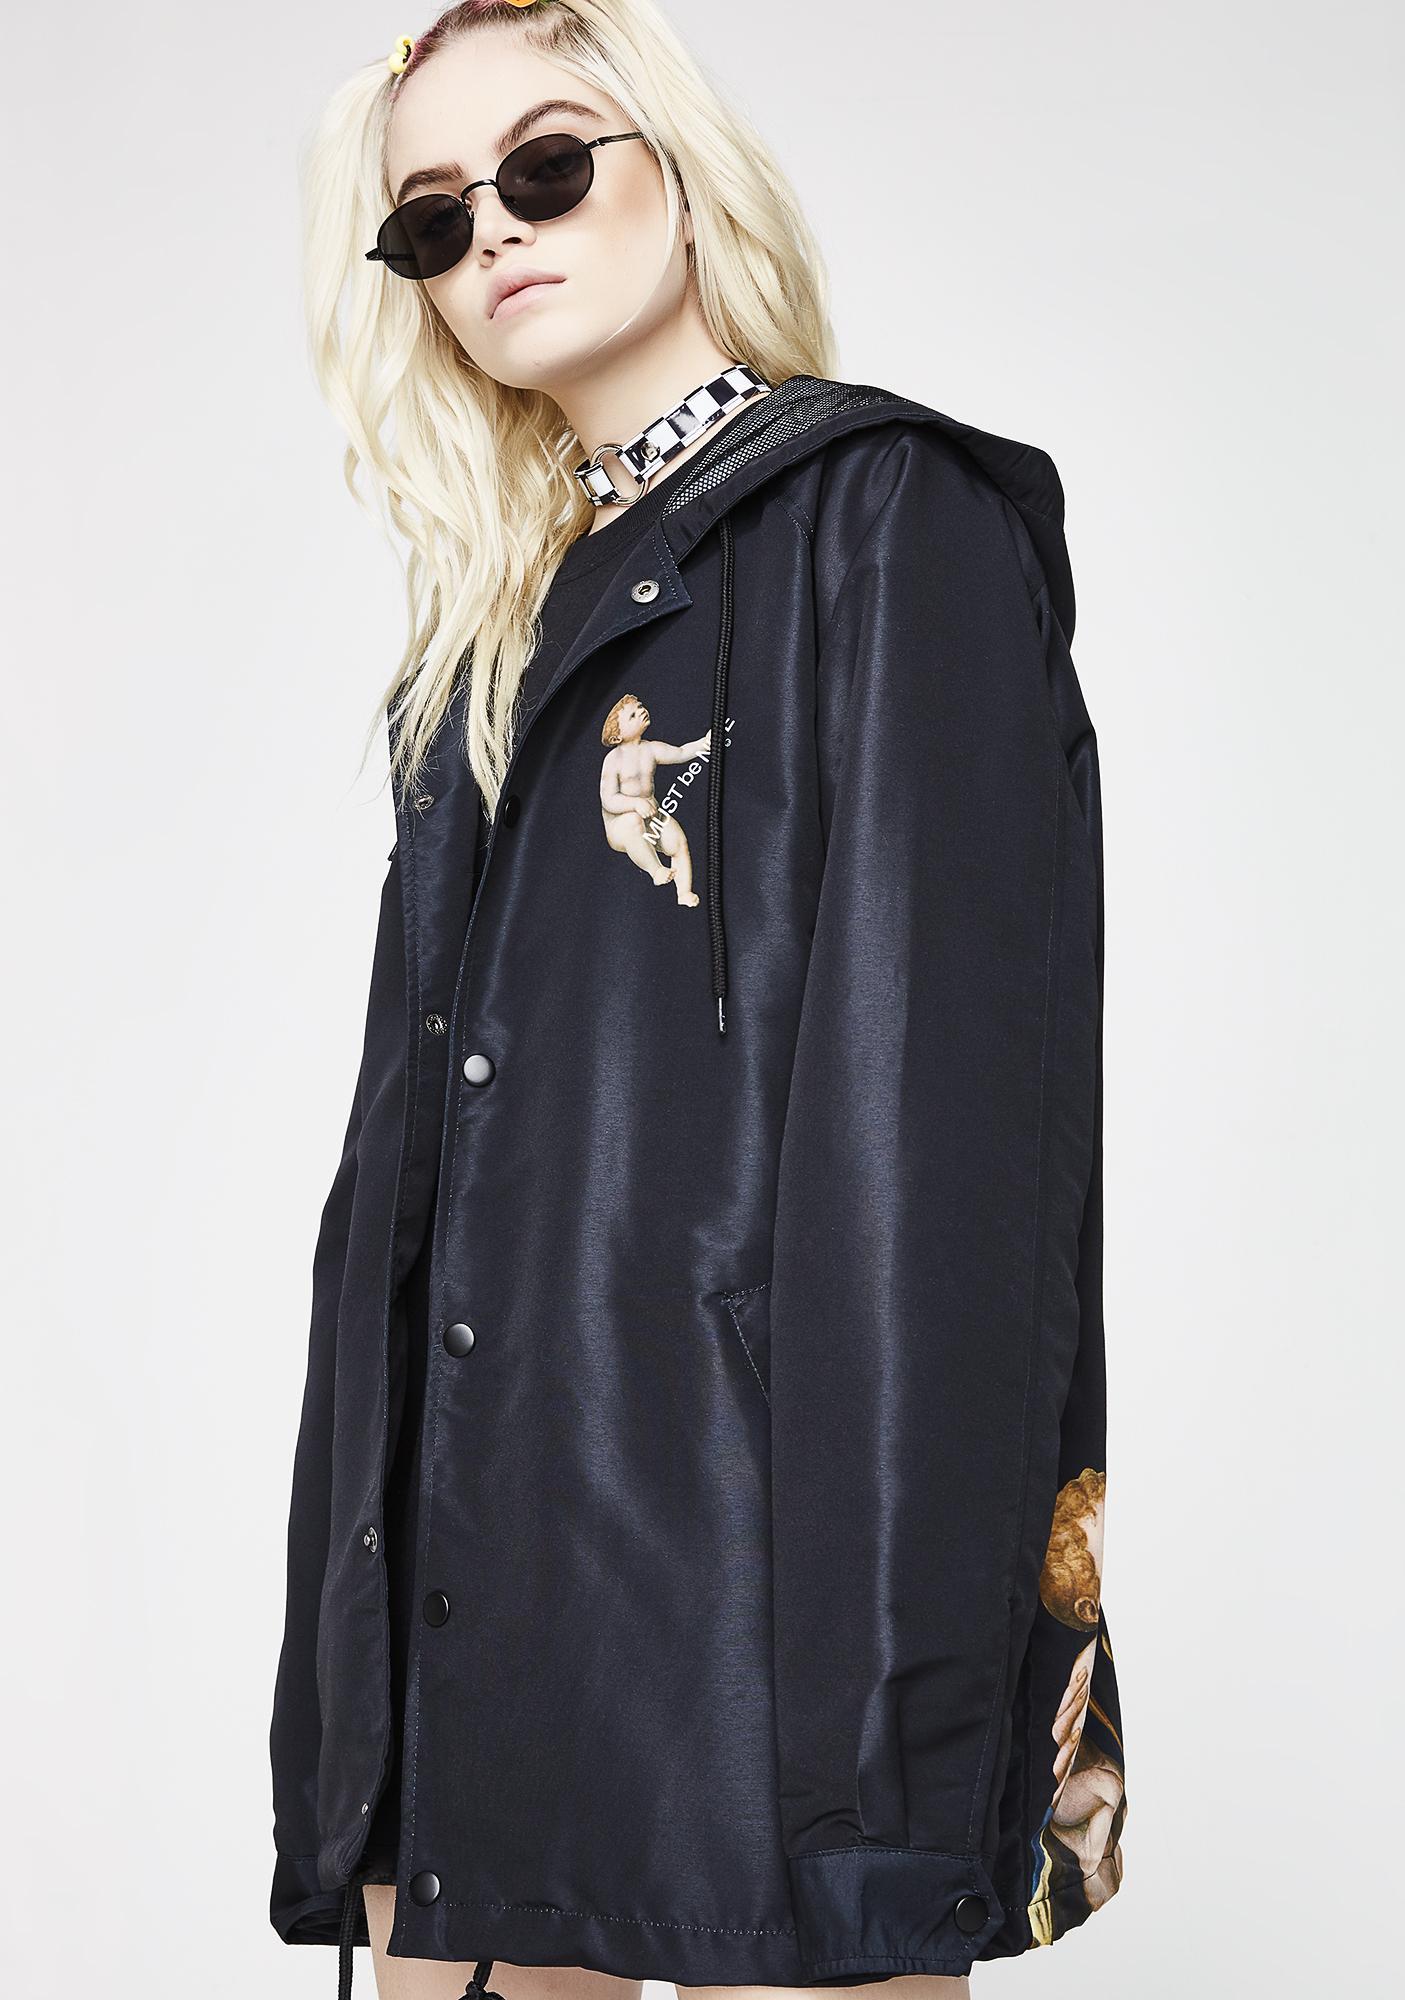 RIPNDIP Madonna Jacket